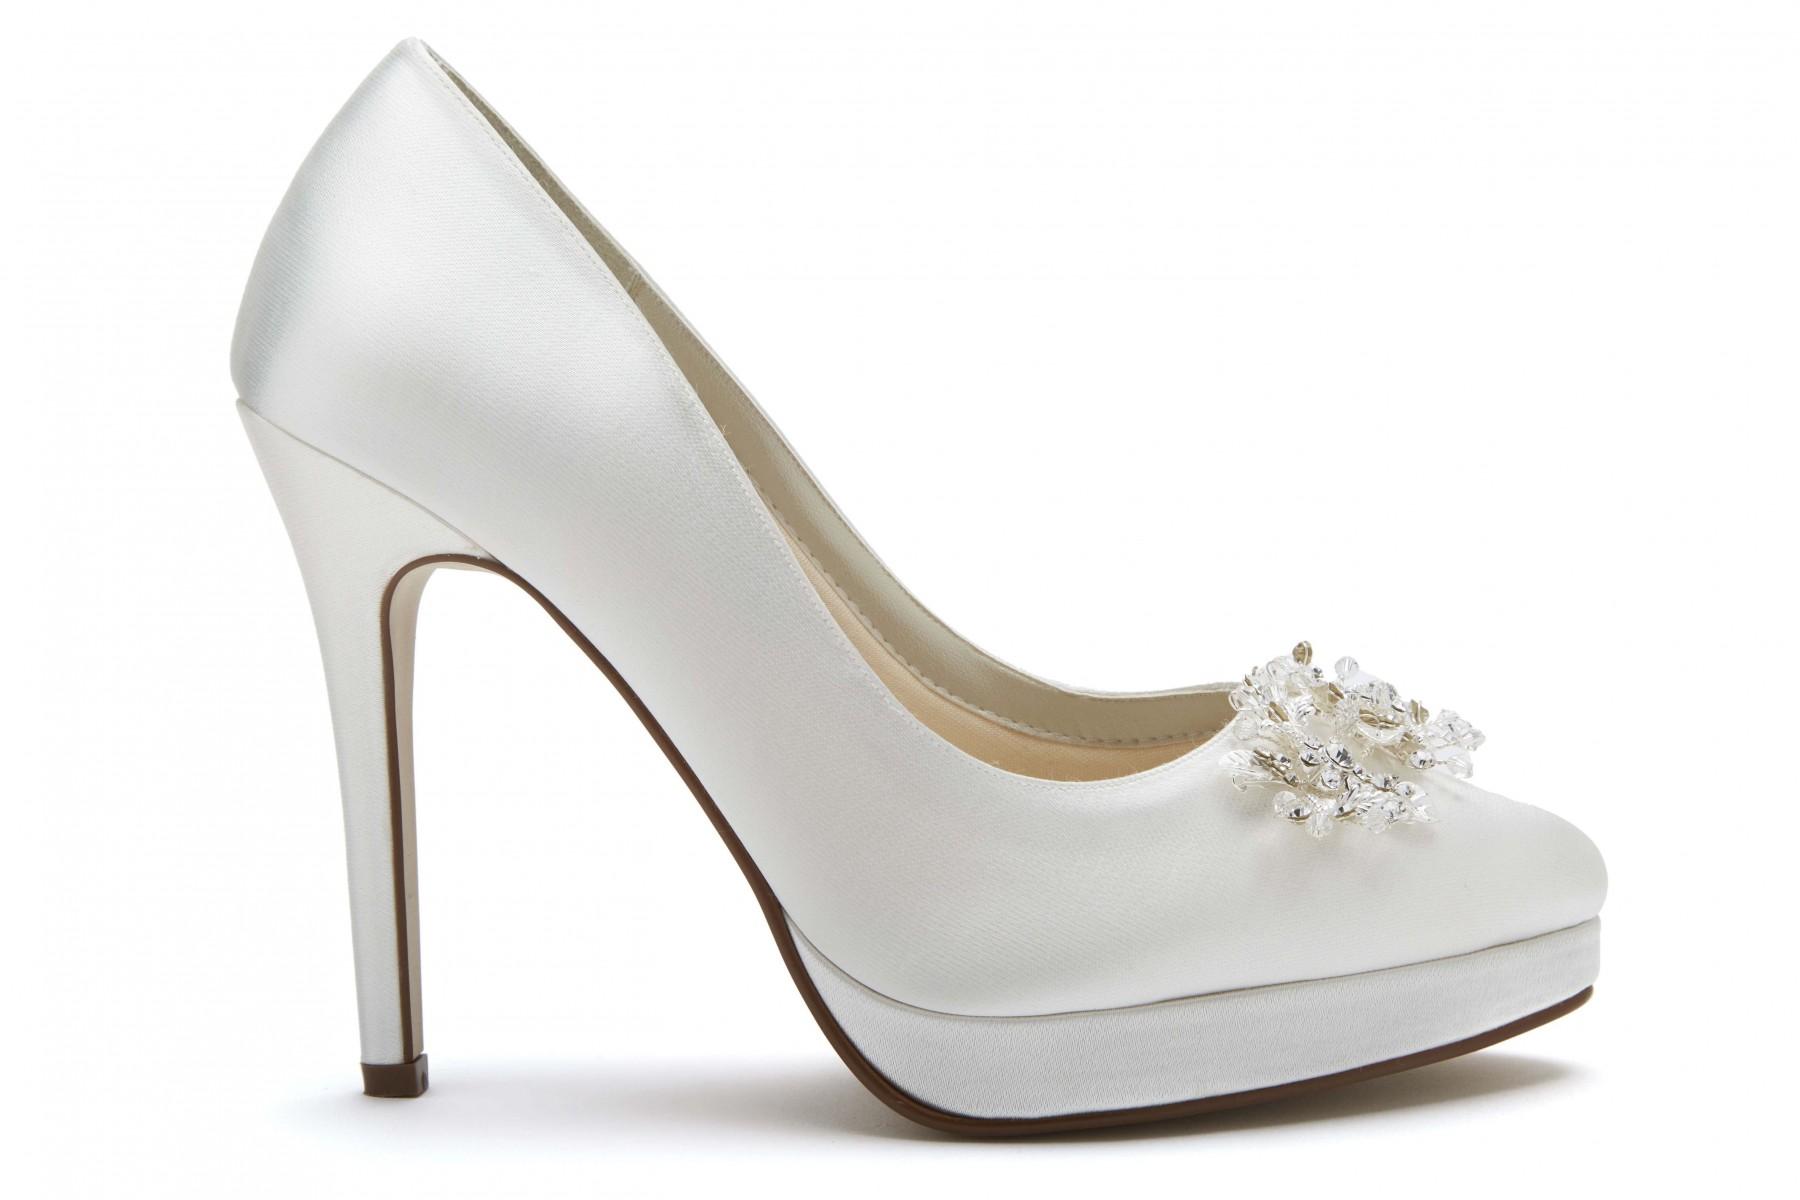 8b40af983e9 Rainbow Club Skye - Ivory Satin Platform Shoes with Floral Crystal Trim